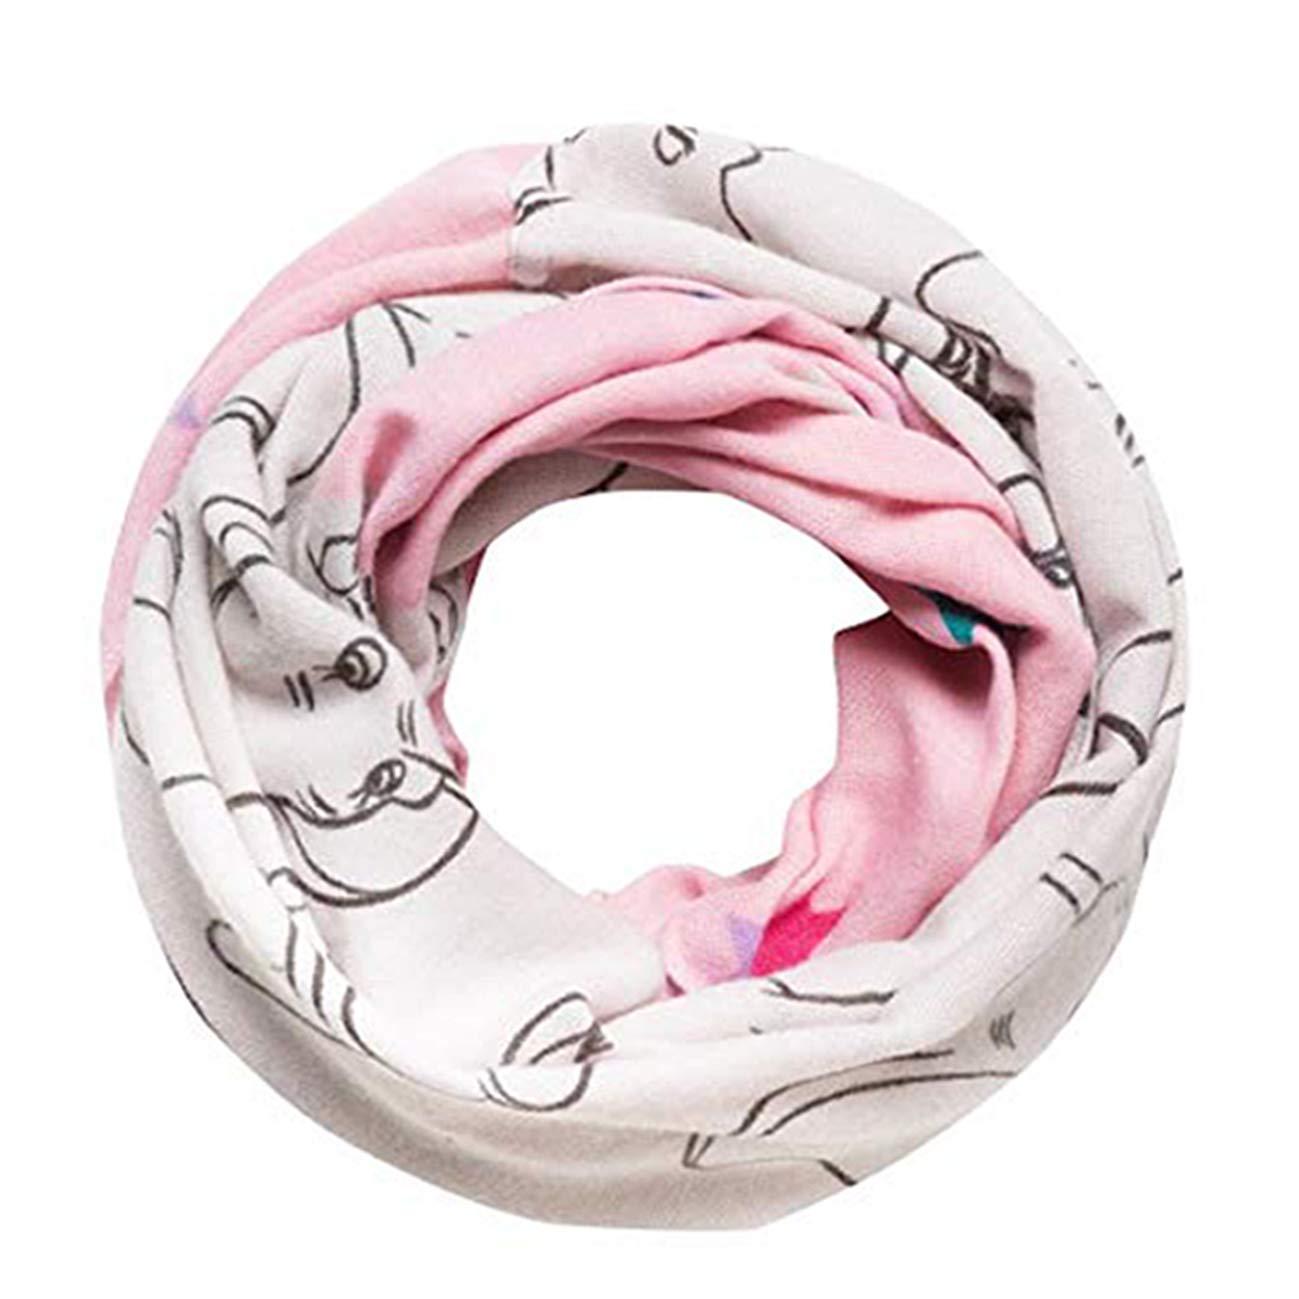 CODELLO DUMBO LOOP mit DUMBO und STERNEN rosa grau 82083713 82083713-17